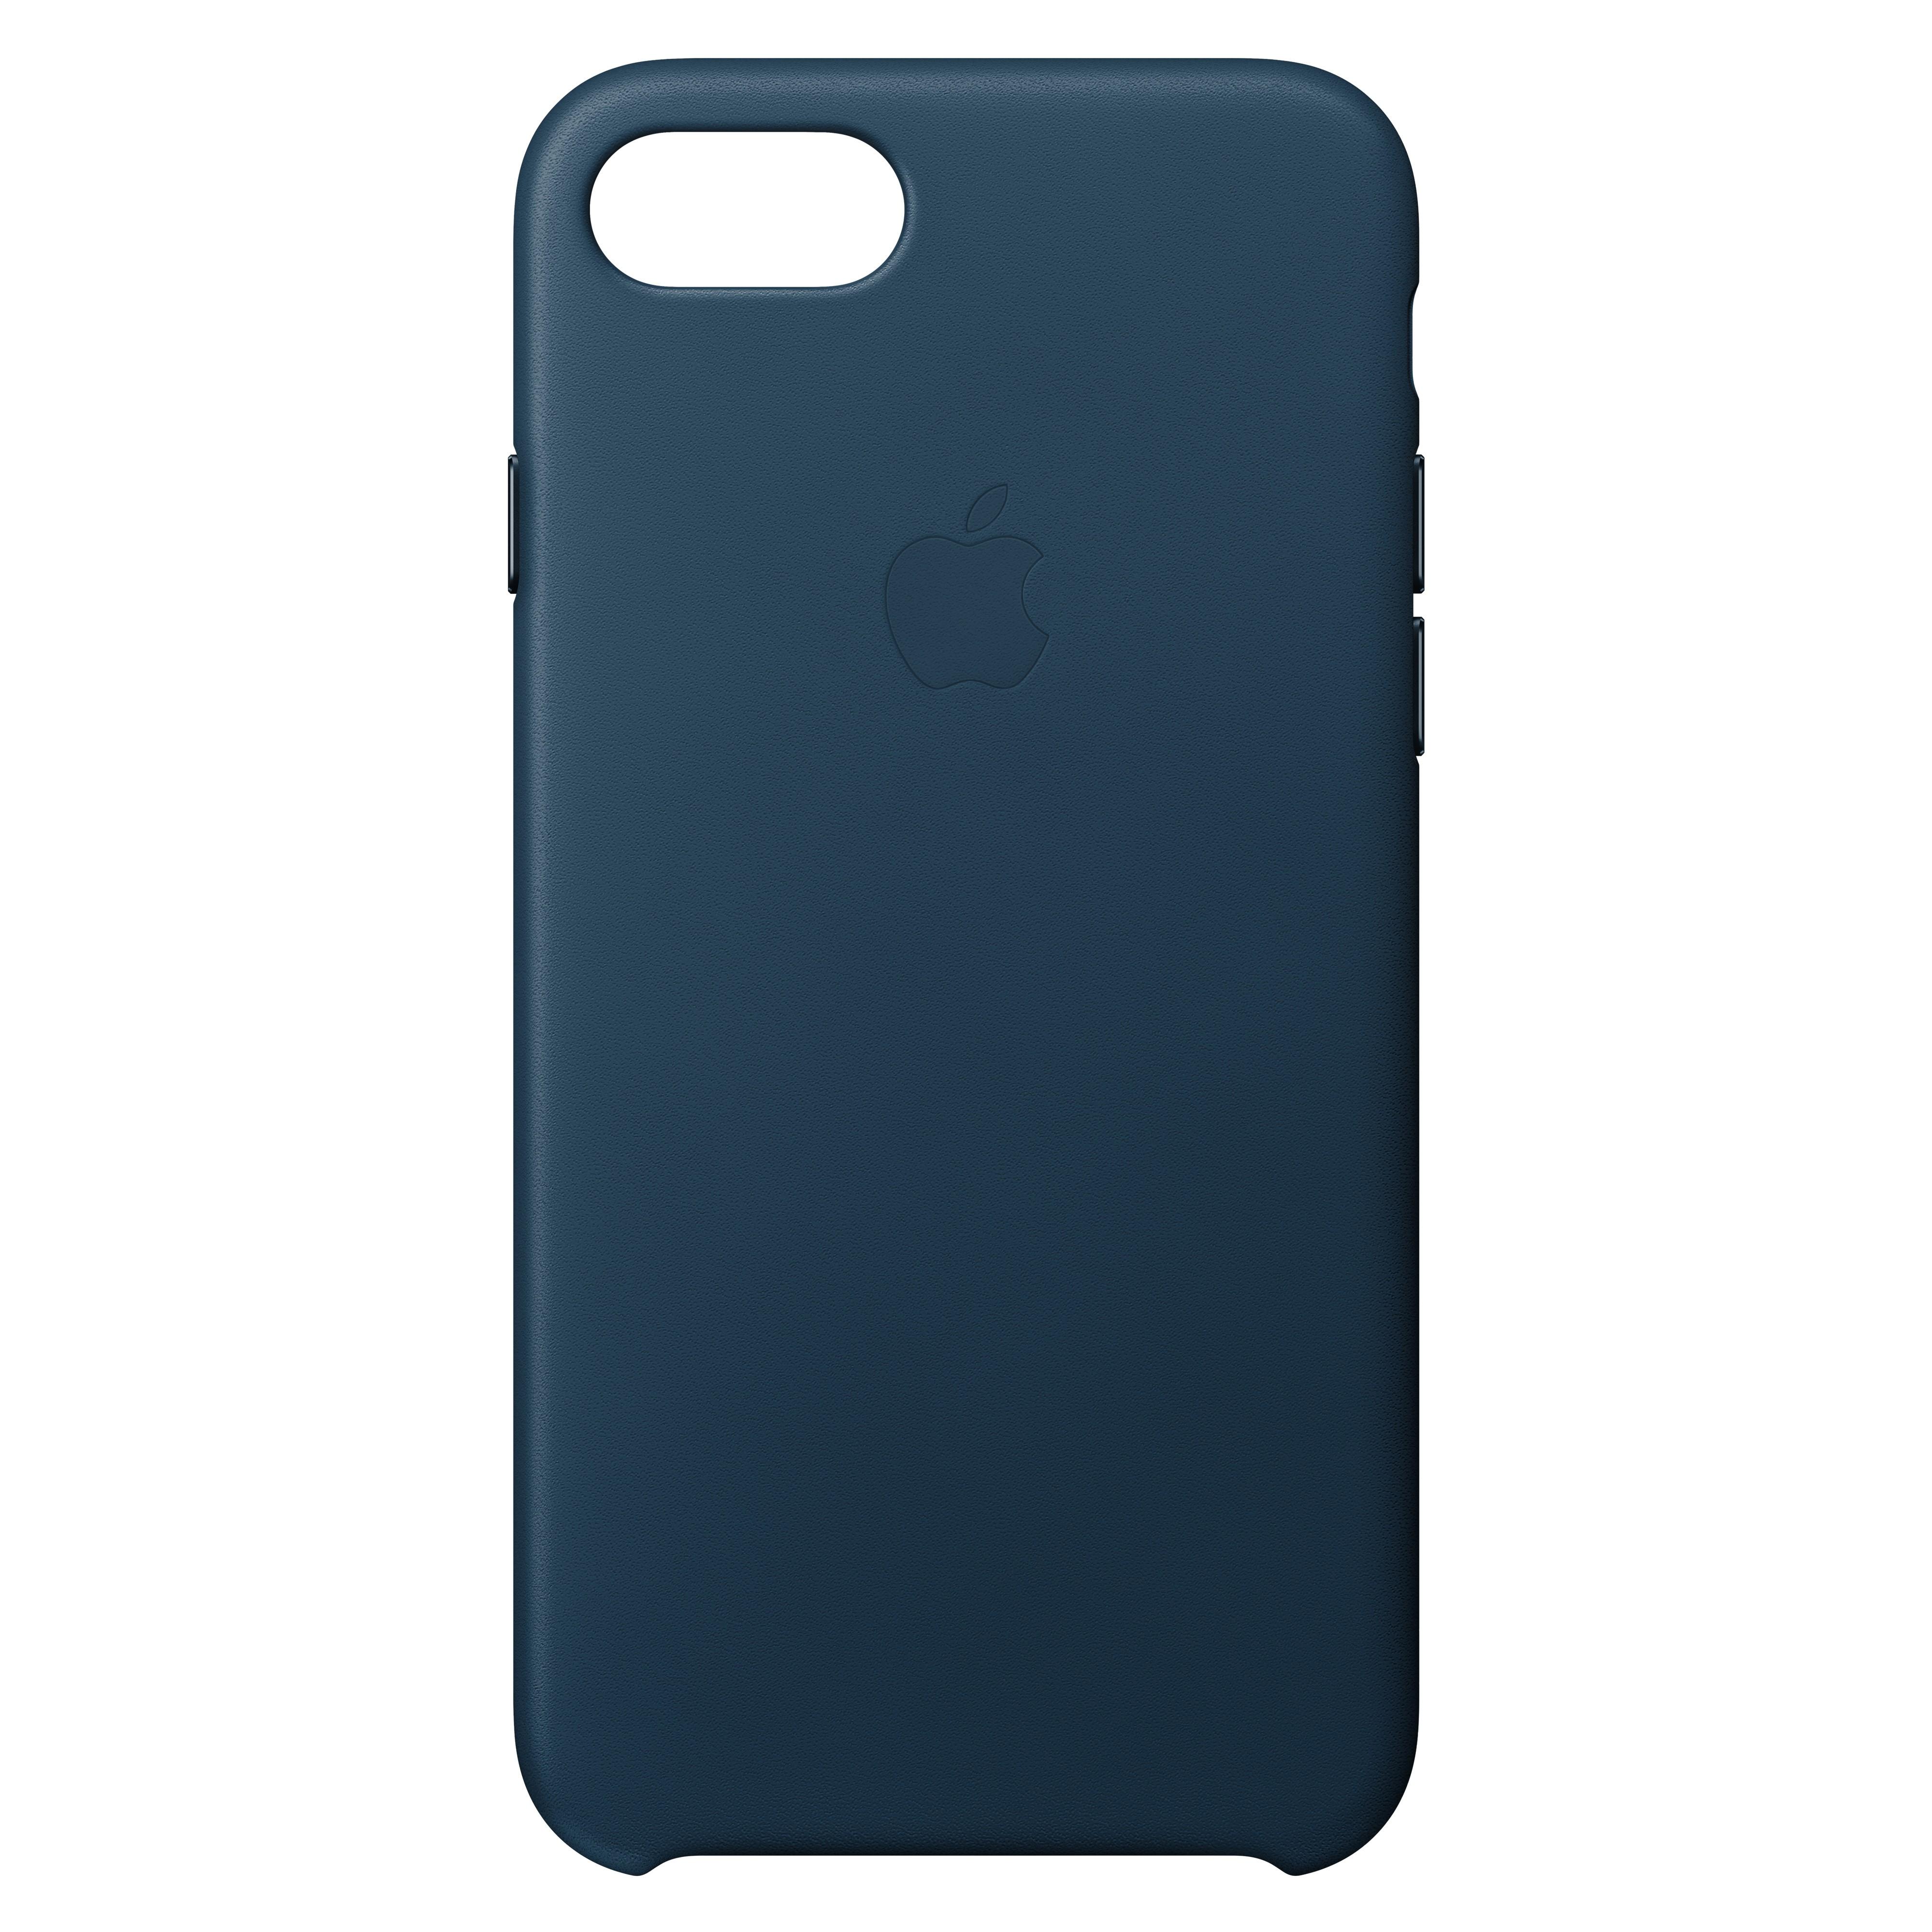 MQHF2ZM/A : iPhone 8 skinndeksel (kosmosblå)